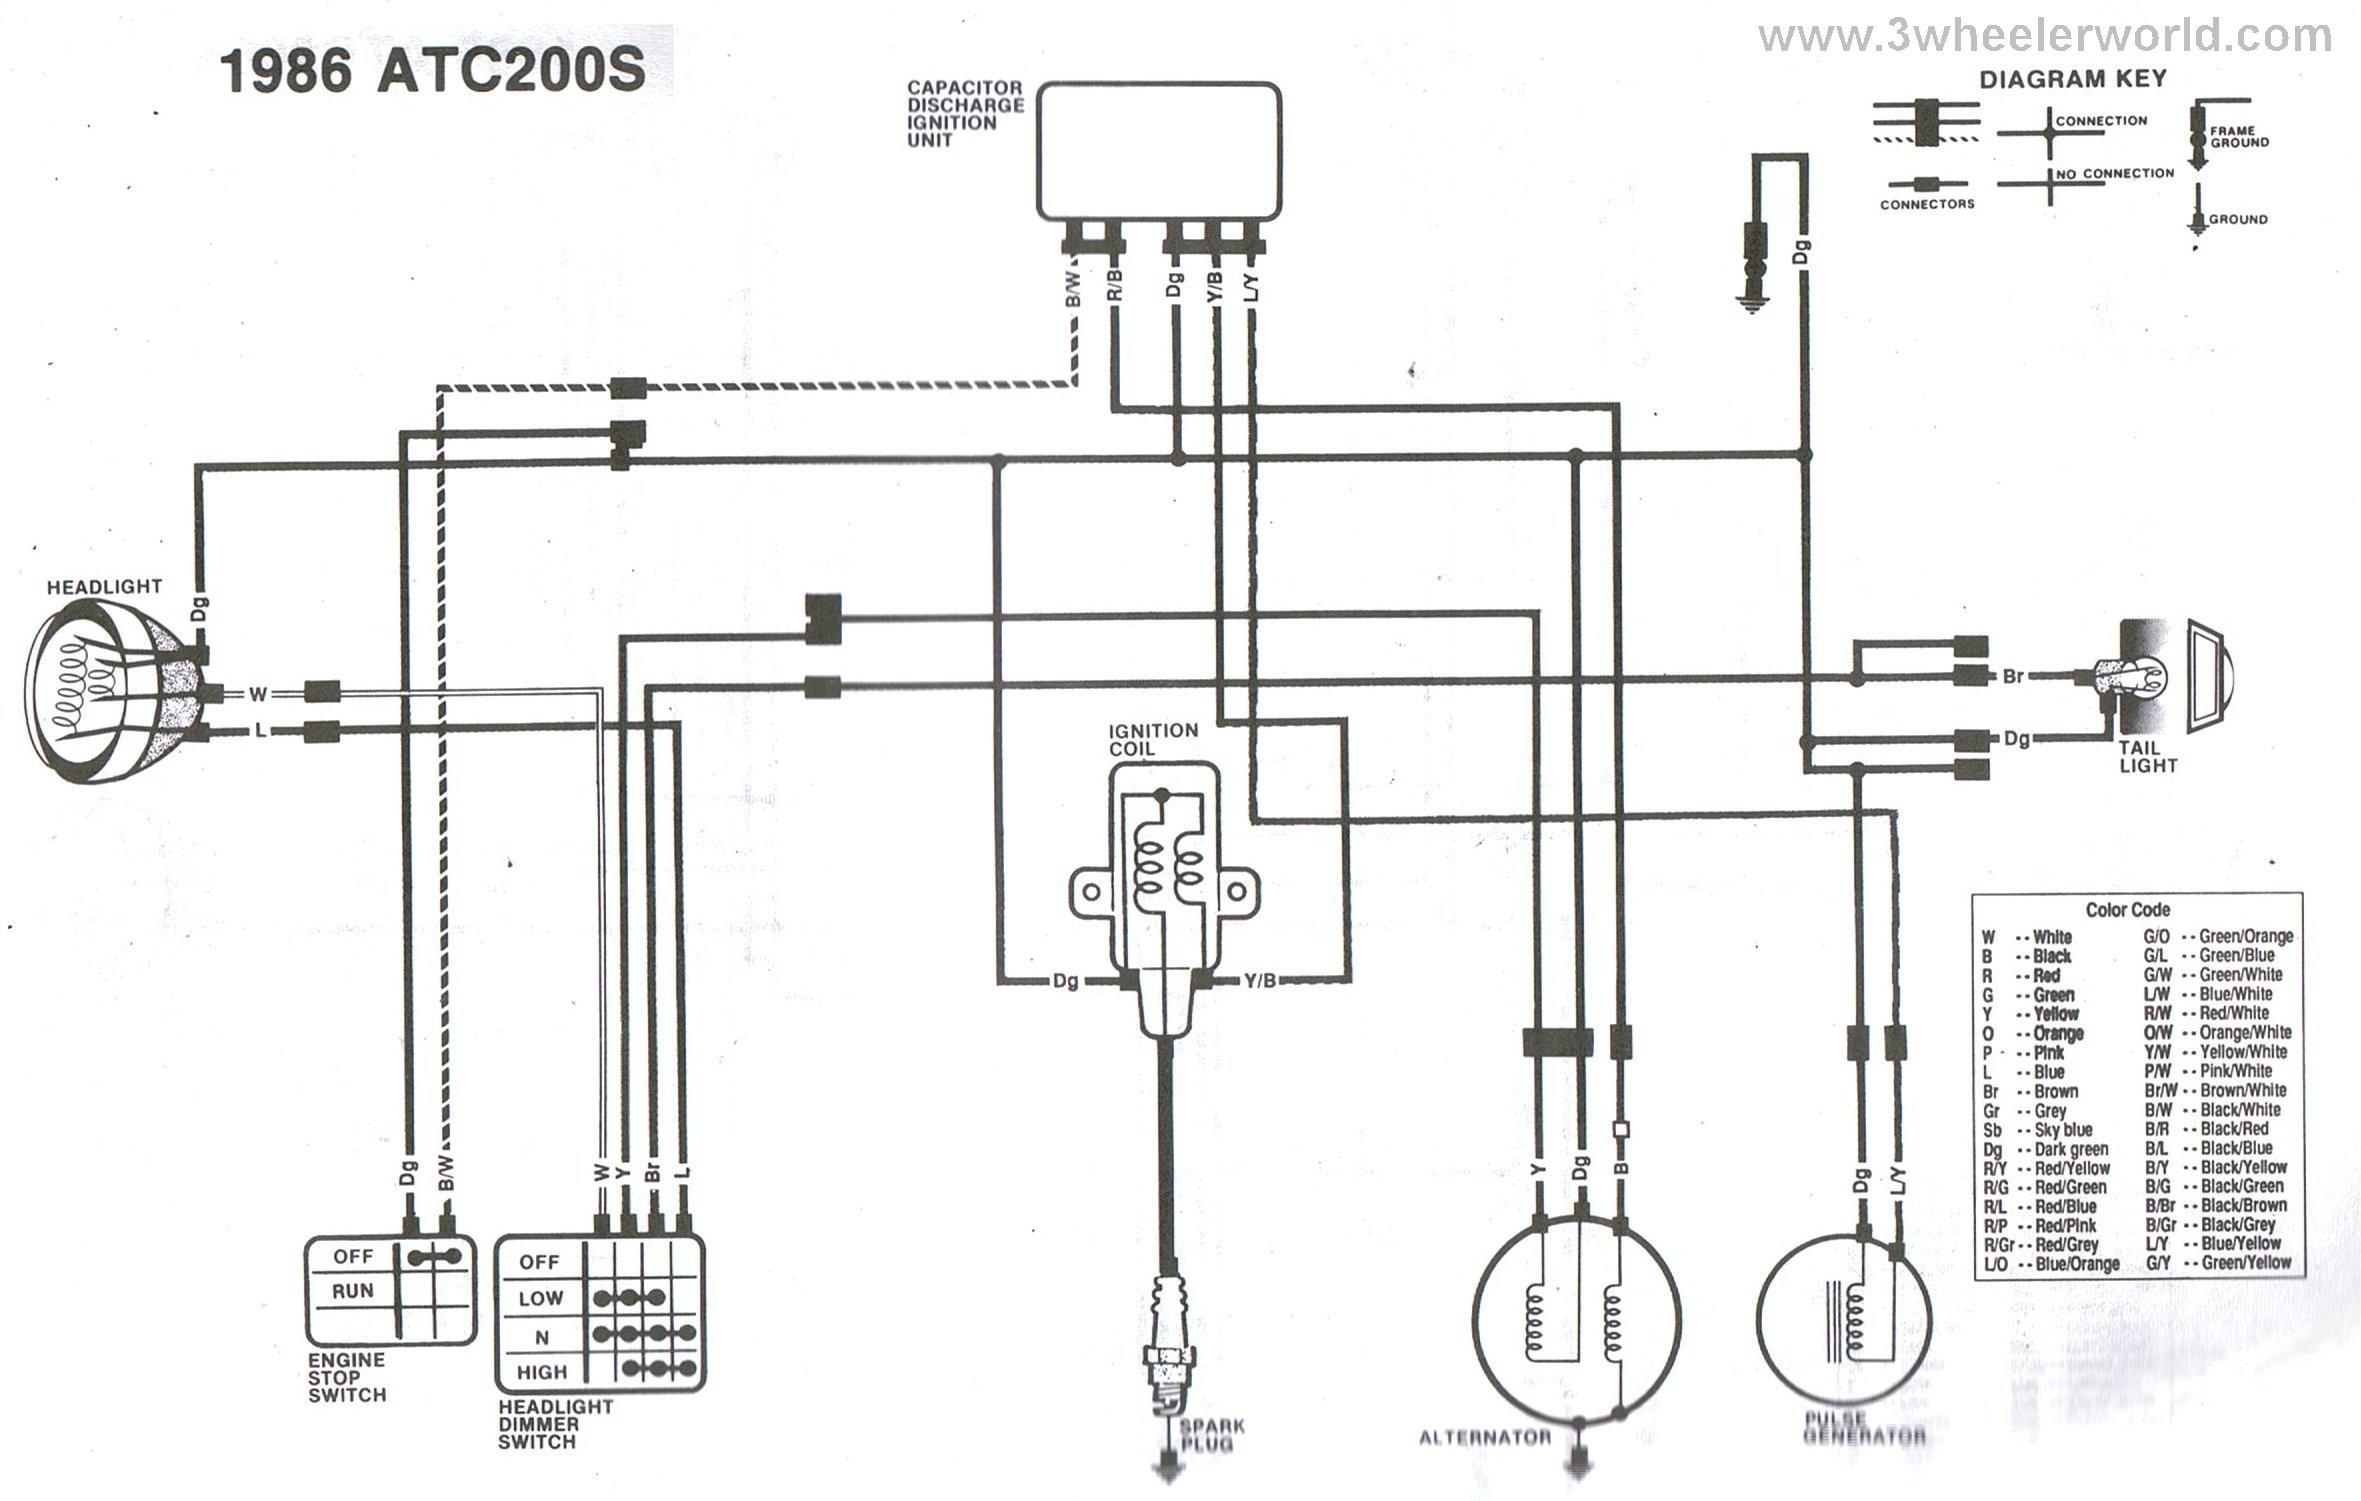 Honda foreman 450 Parts Diagram Free Honda Wiring Diagram Another Blog About Wiring Diagram • Of Honda foreman 450 Parts Diagram